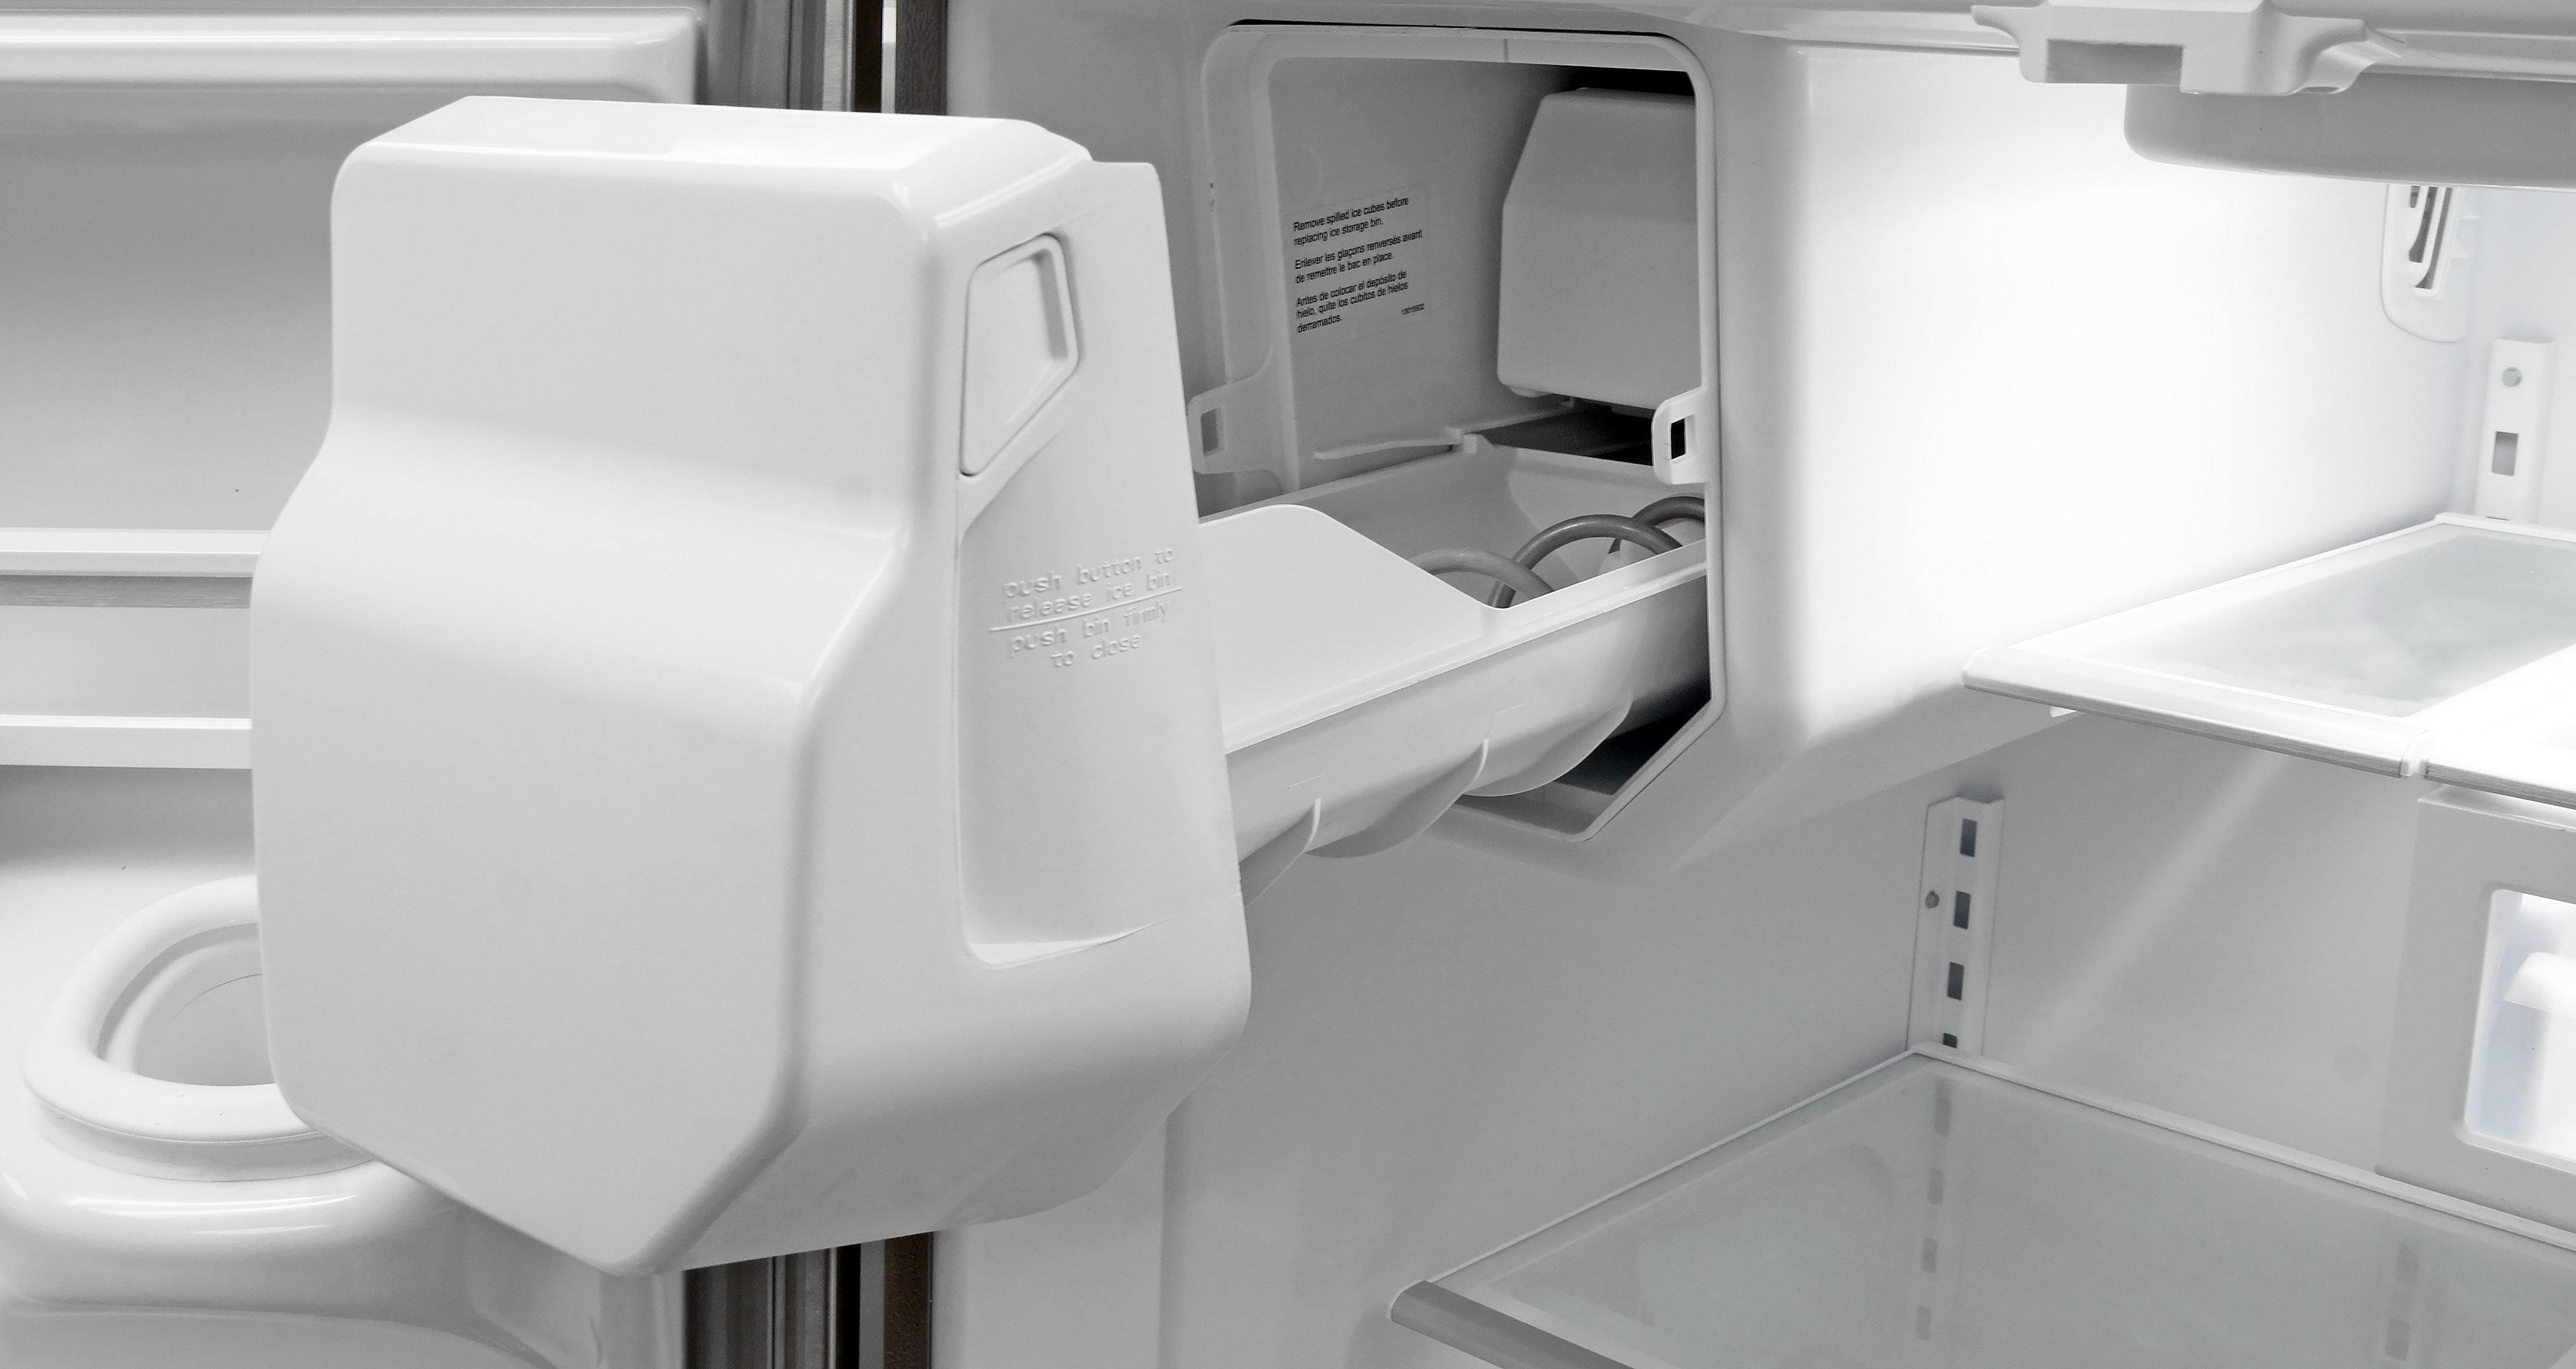 Kitchenaid Kfxs25ryms Refrigerator Review Reviewed Refrigerators